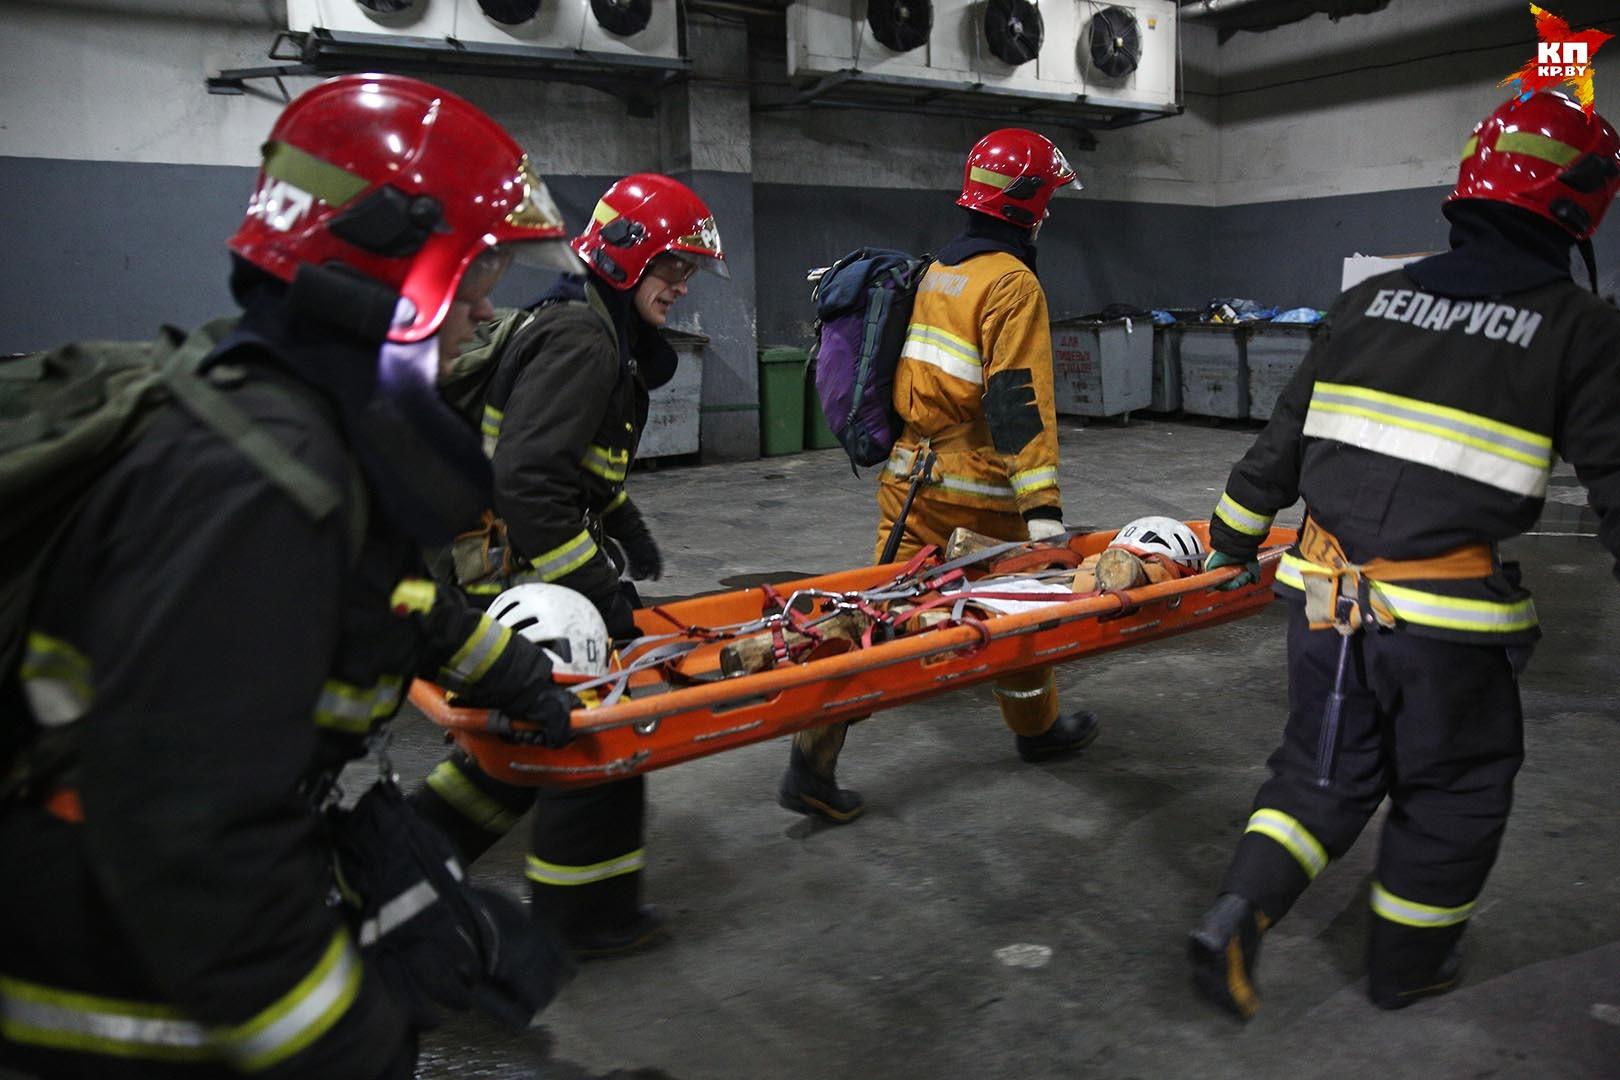 В ТЦ «Столица» спасатели отрабатывали ликвидацию ЧП.